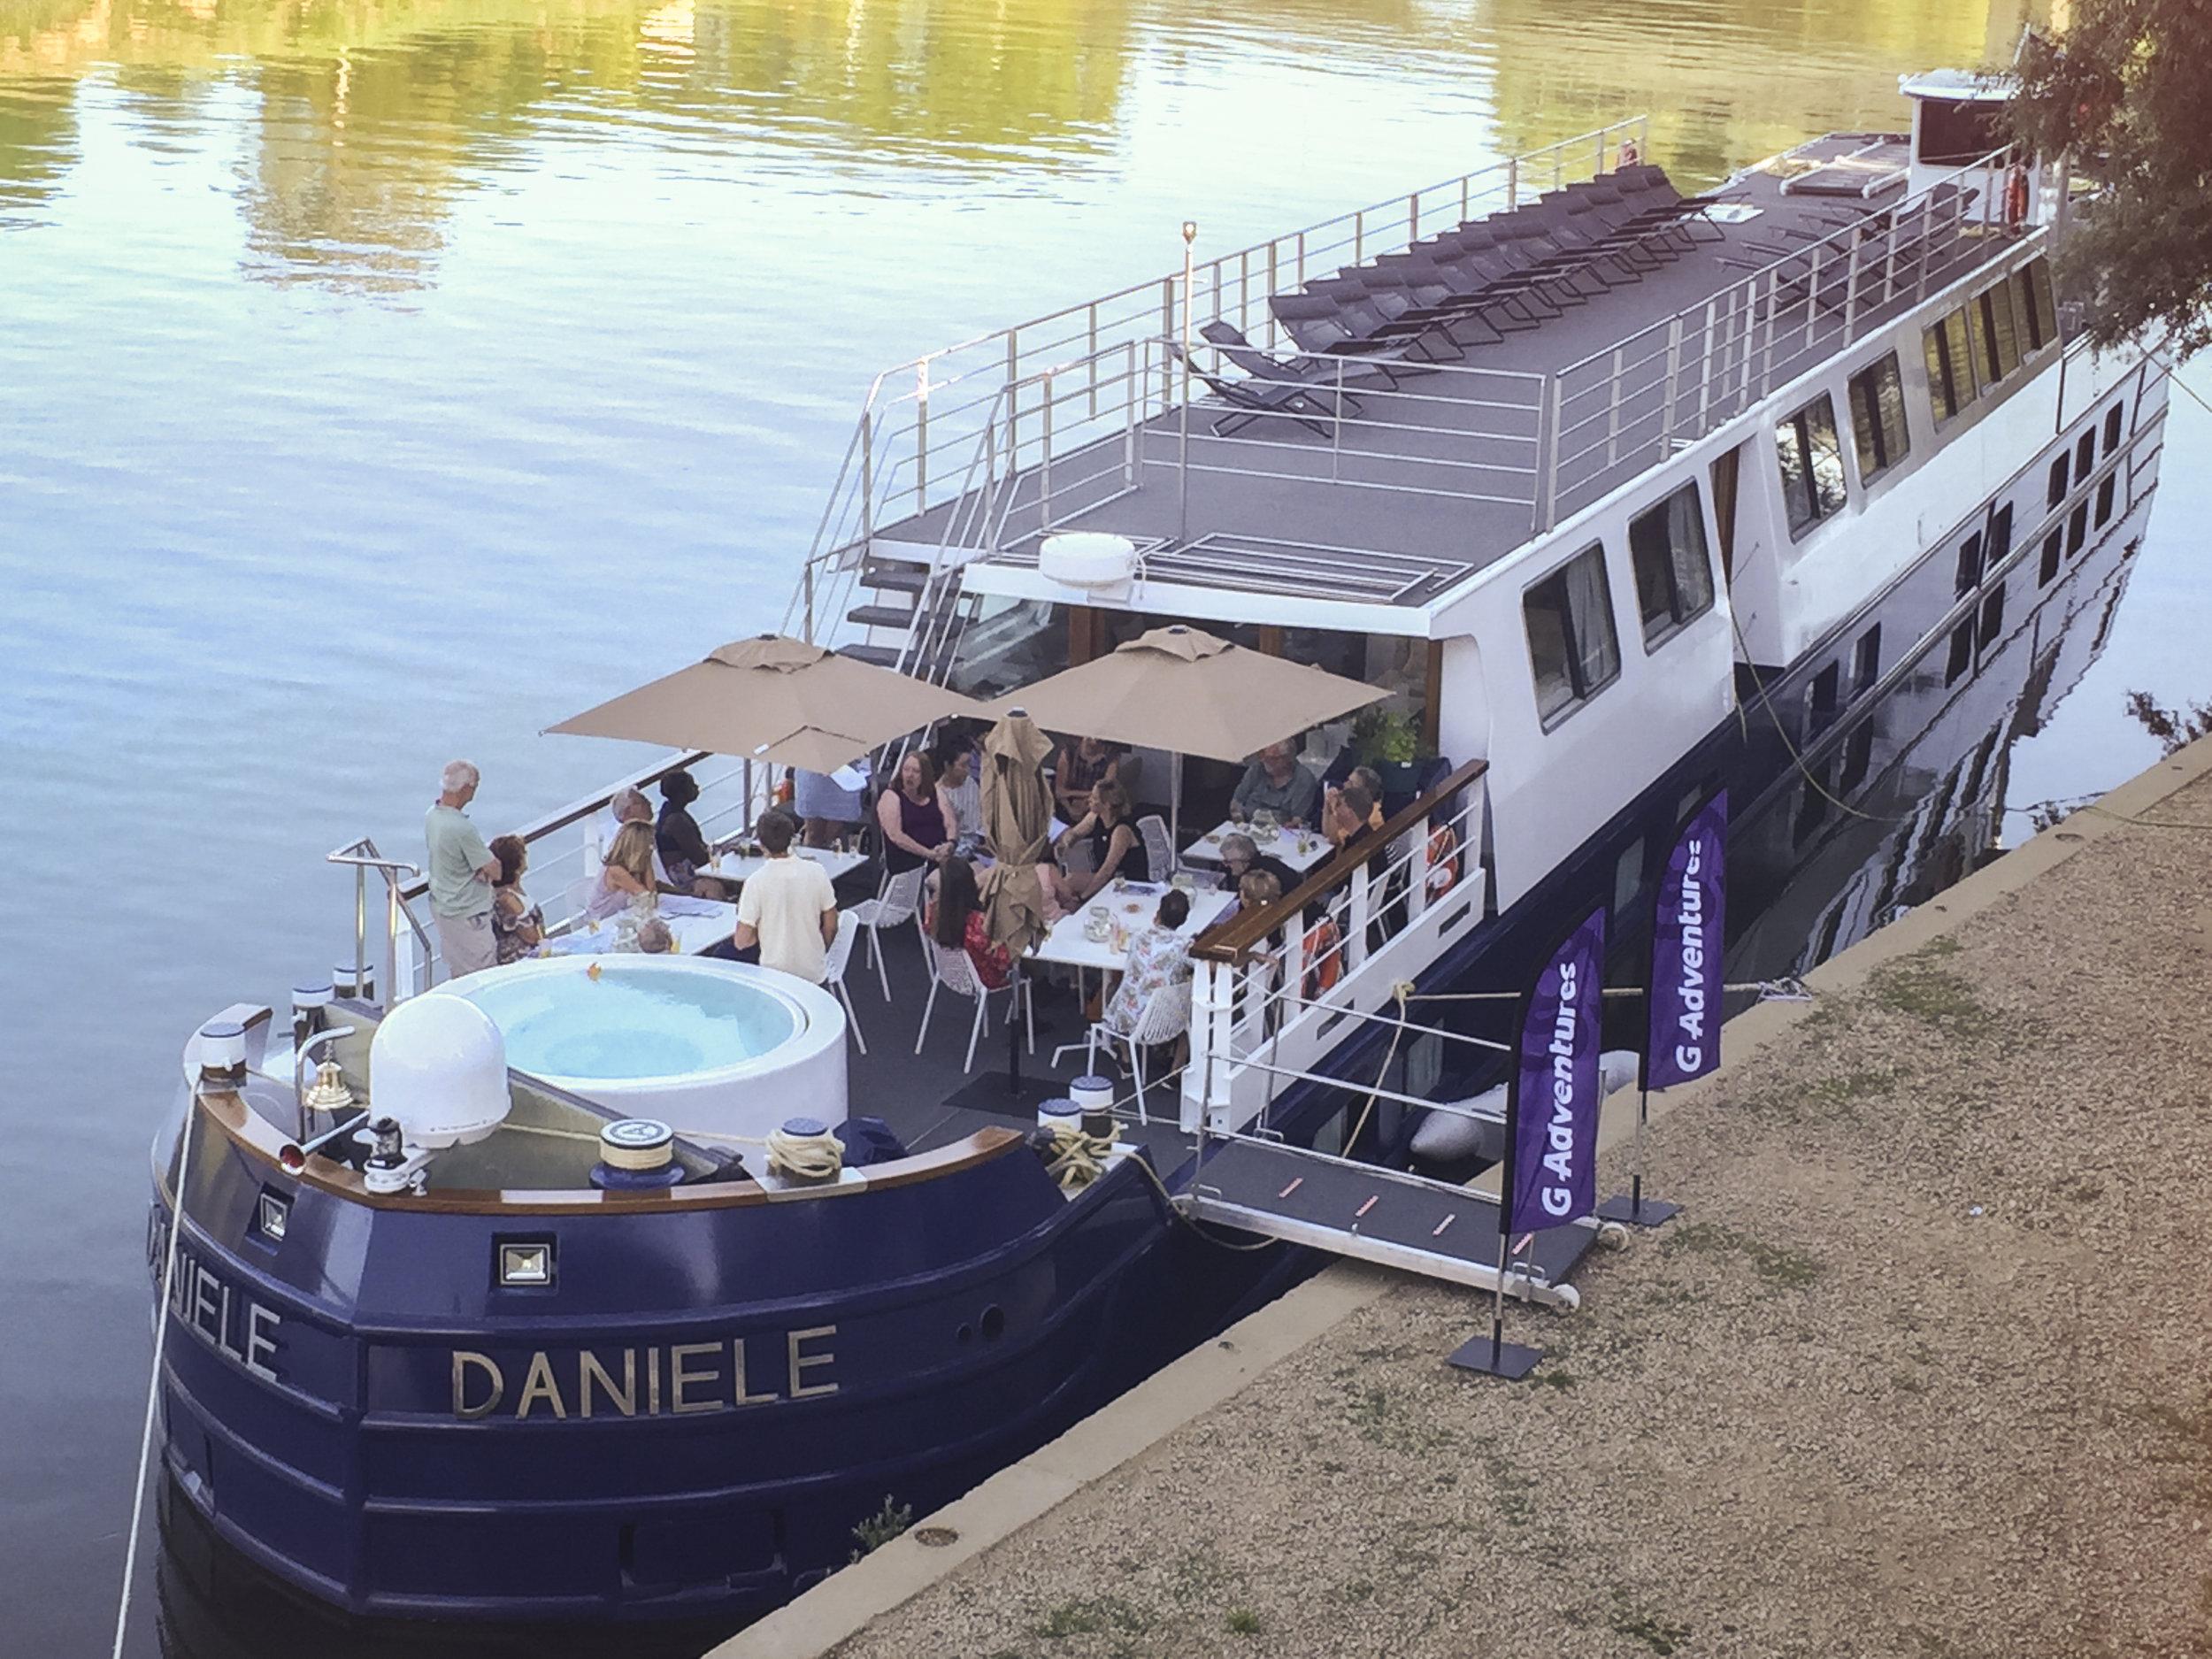 France Burgundy Daniele Riverboat Docked Travellers Deck IMG_3038.jpg